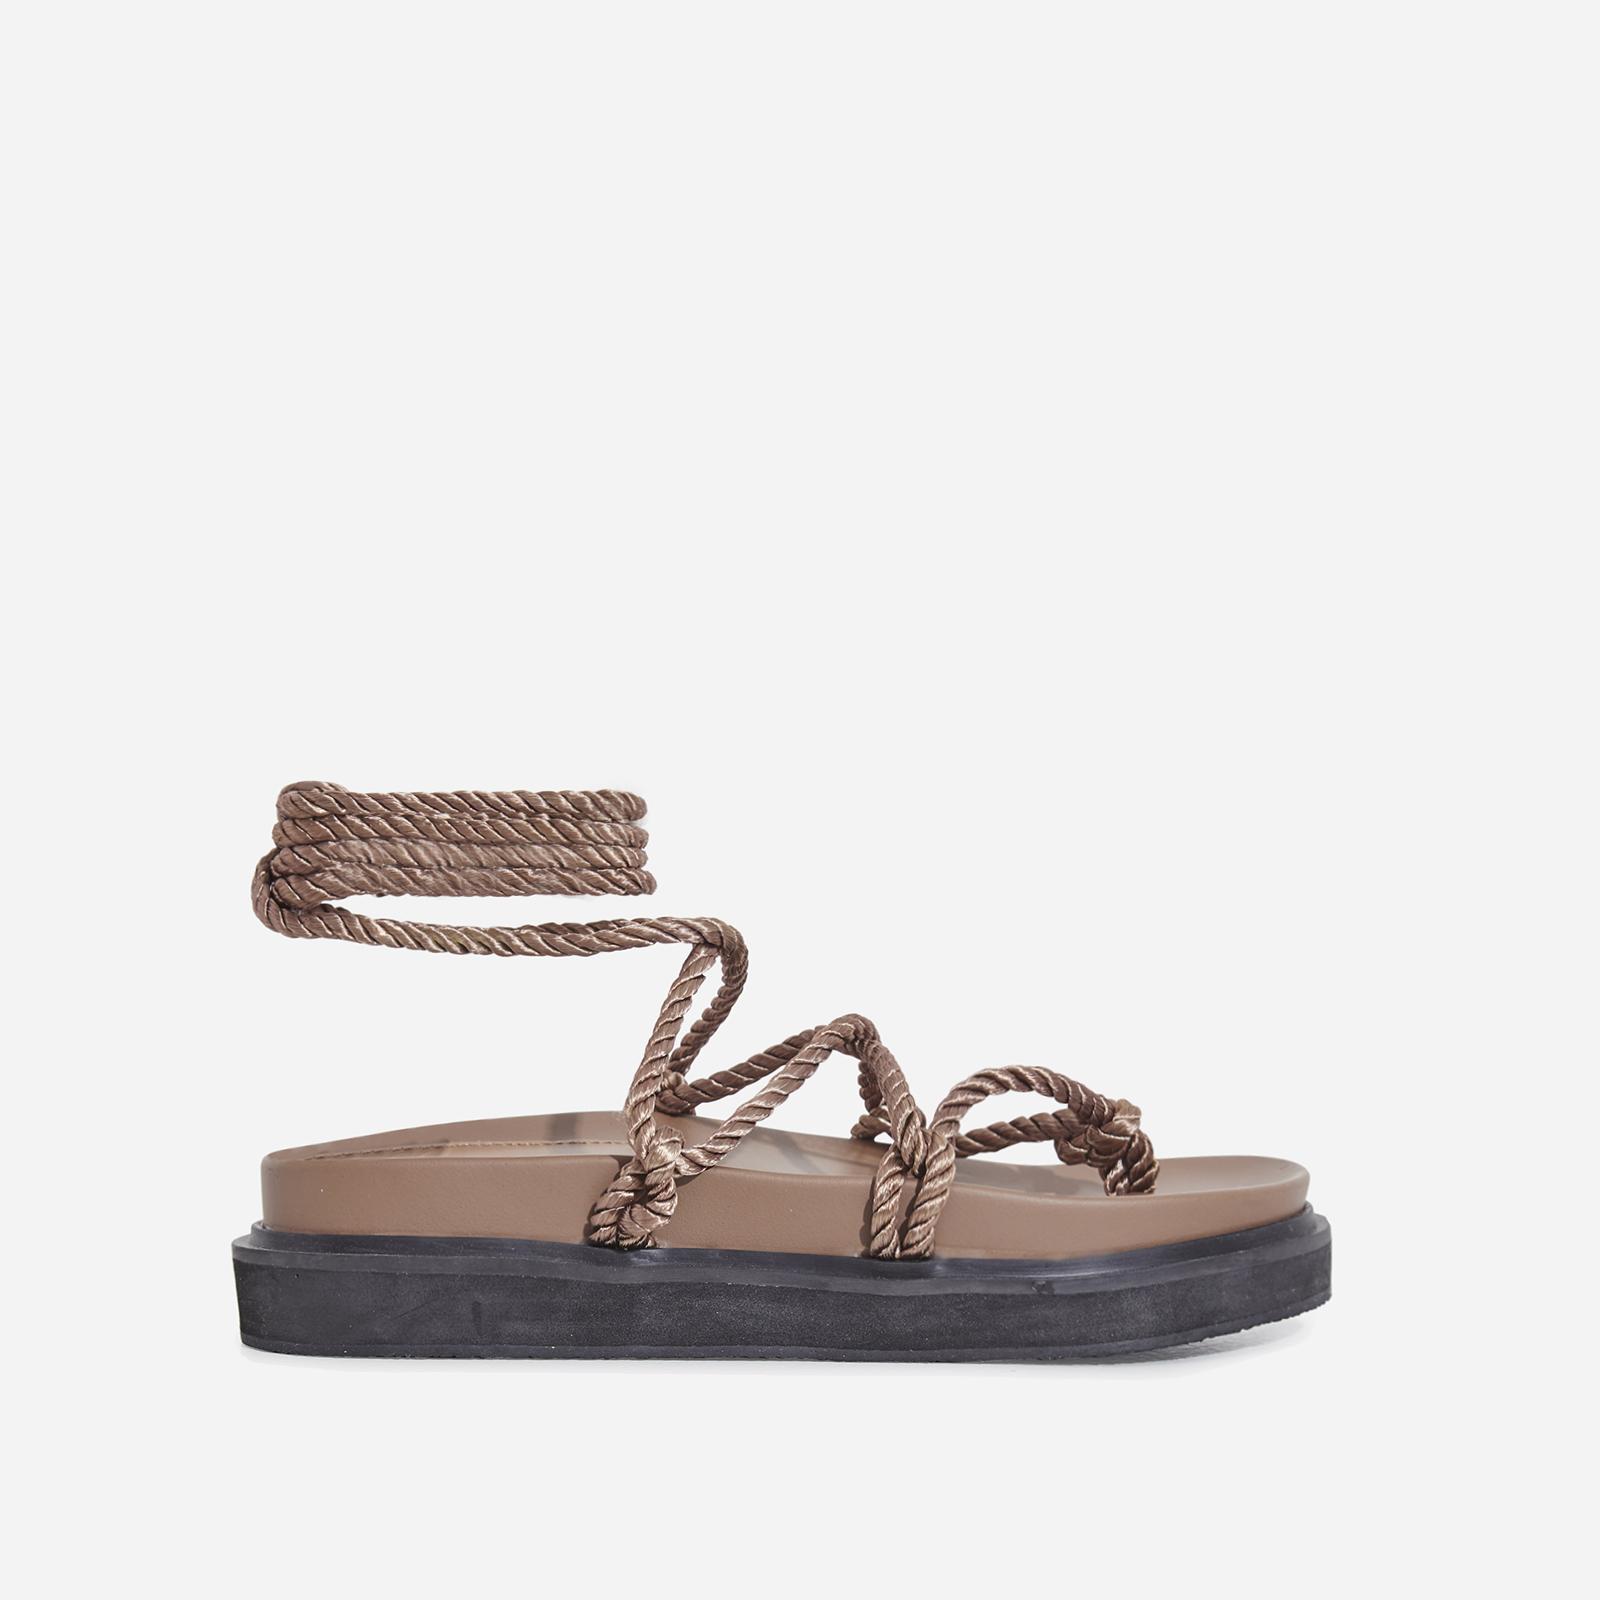 db89e3cd965e Mika Lace Up Rope Espadrille Sandal In Mocha Faux Leather